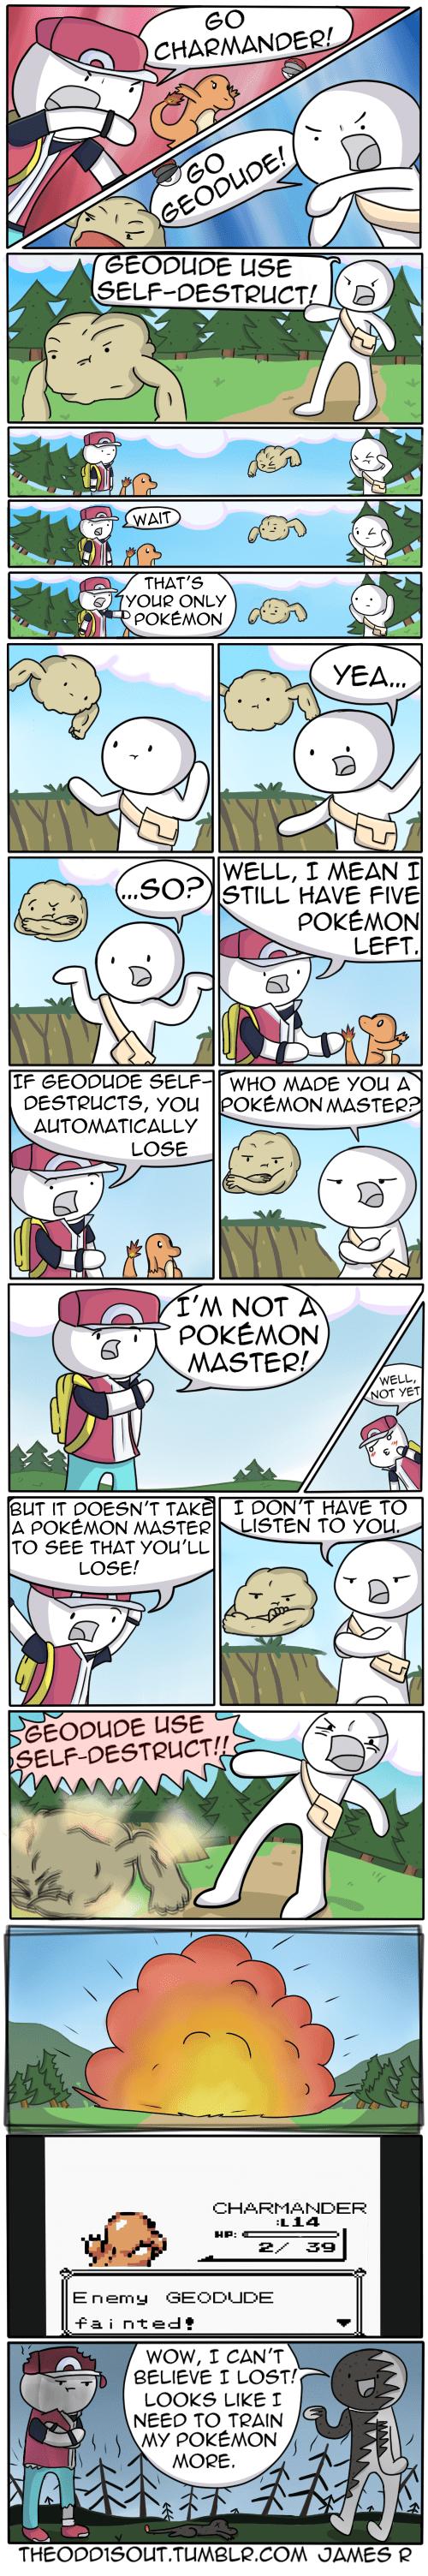 Pokémon red comics selfdestruct web comics - 7679709184